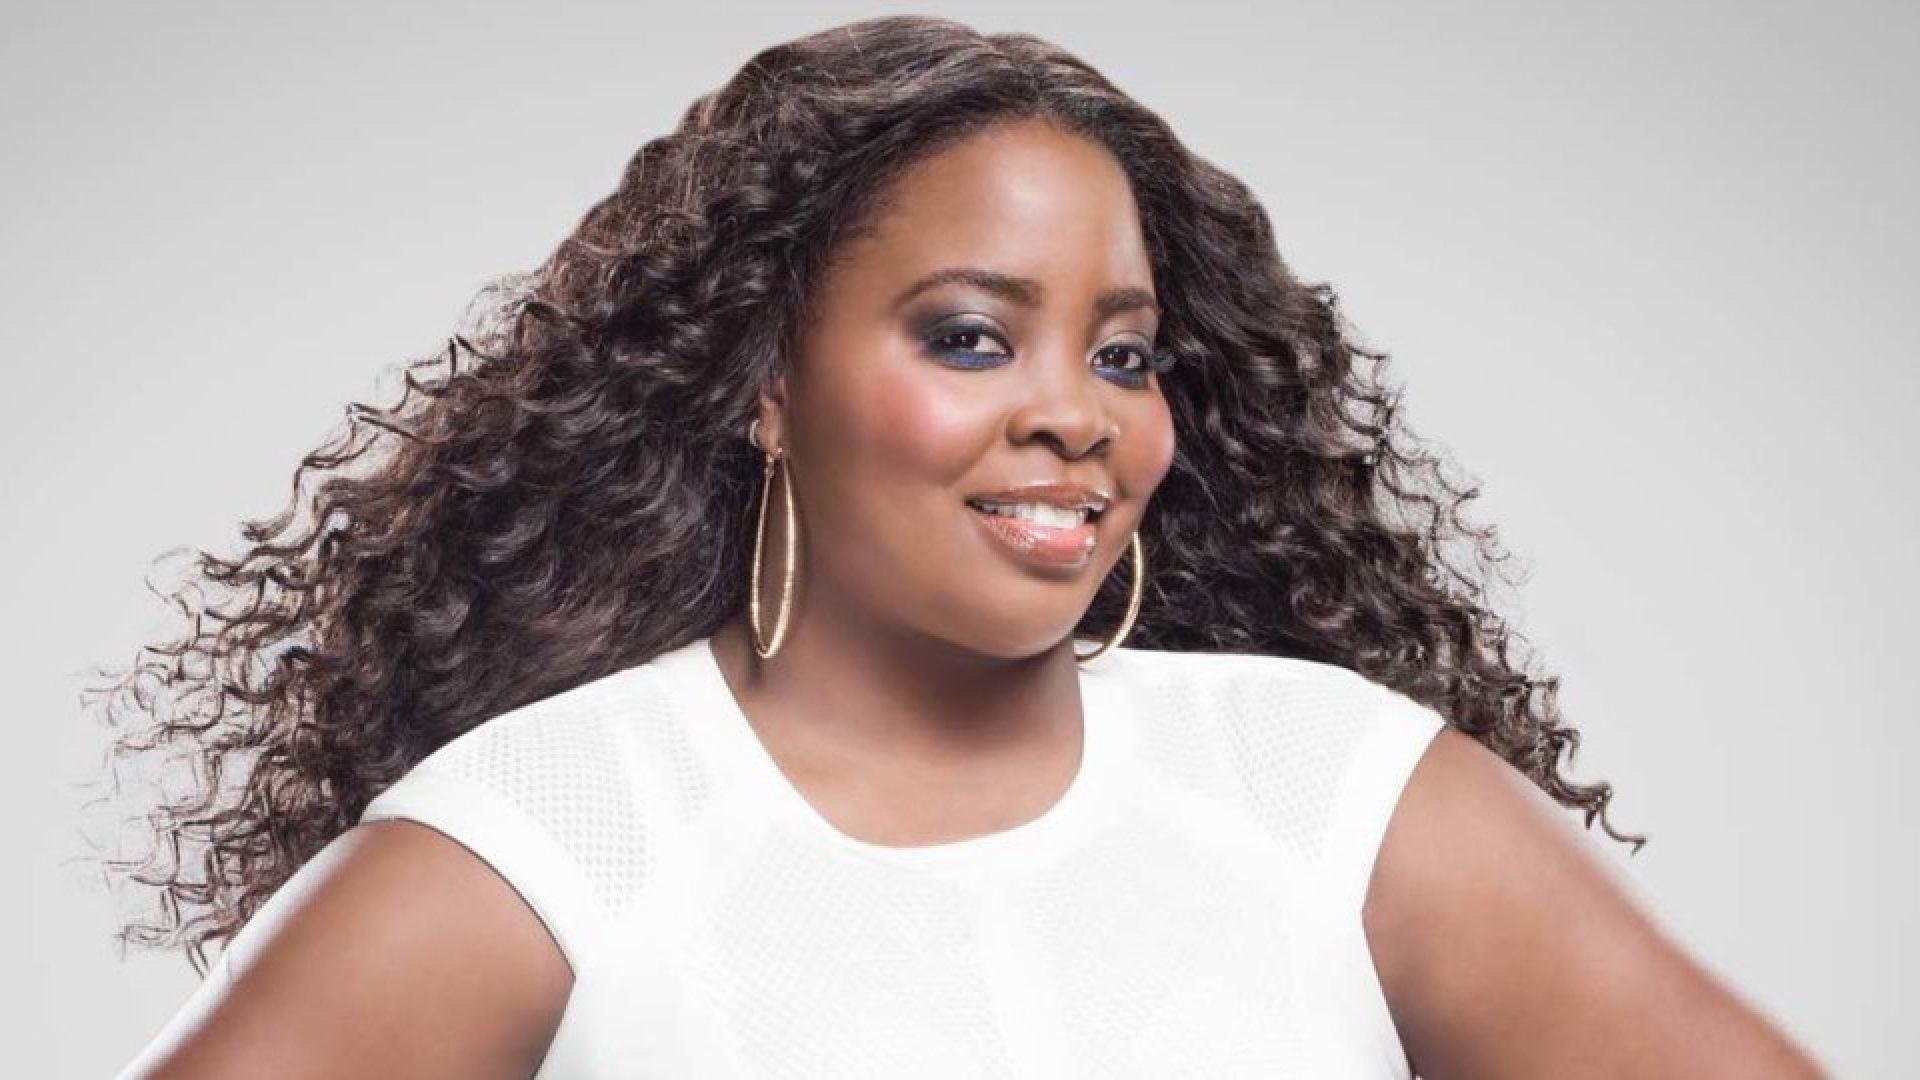 Kim Kimble Haircare Proves That Effective Entrepreneurship Serves A Need